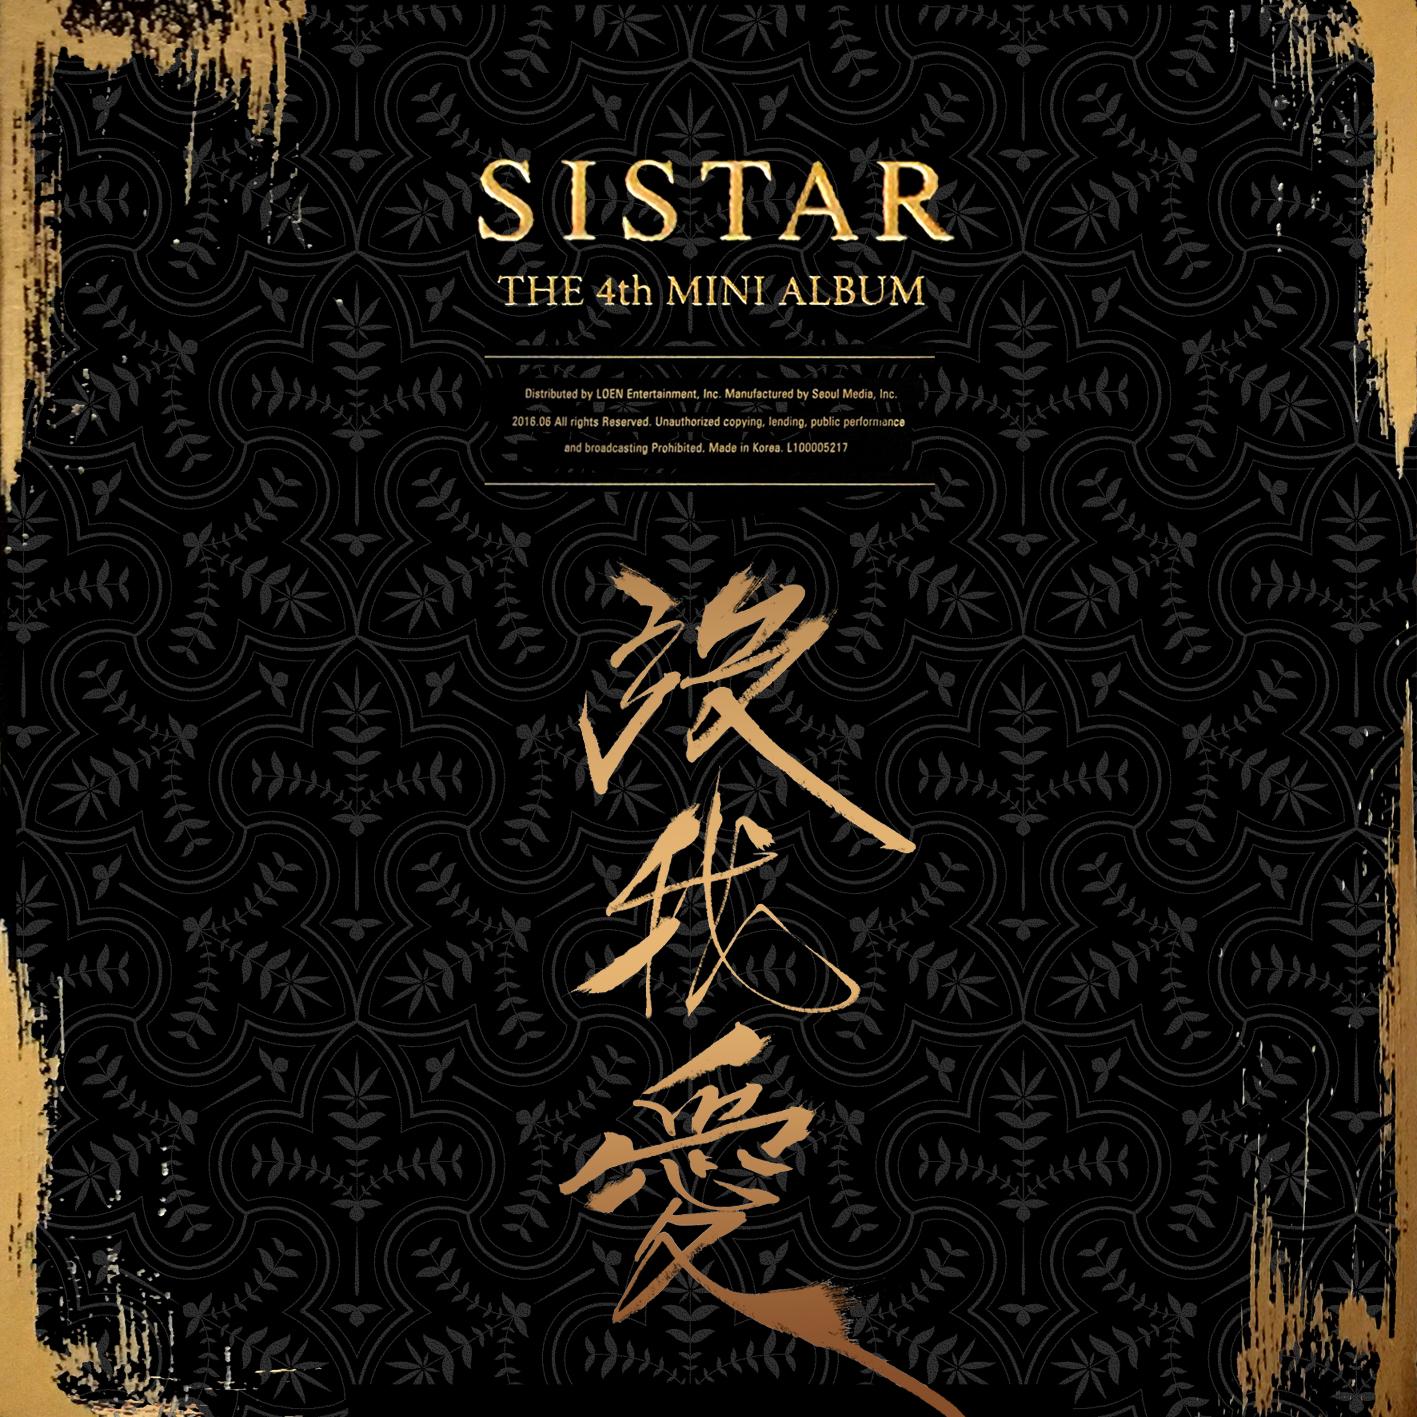 Kpop Hotness: [DOWNLOAD] SISTAR - INSANE LOVE